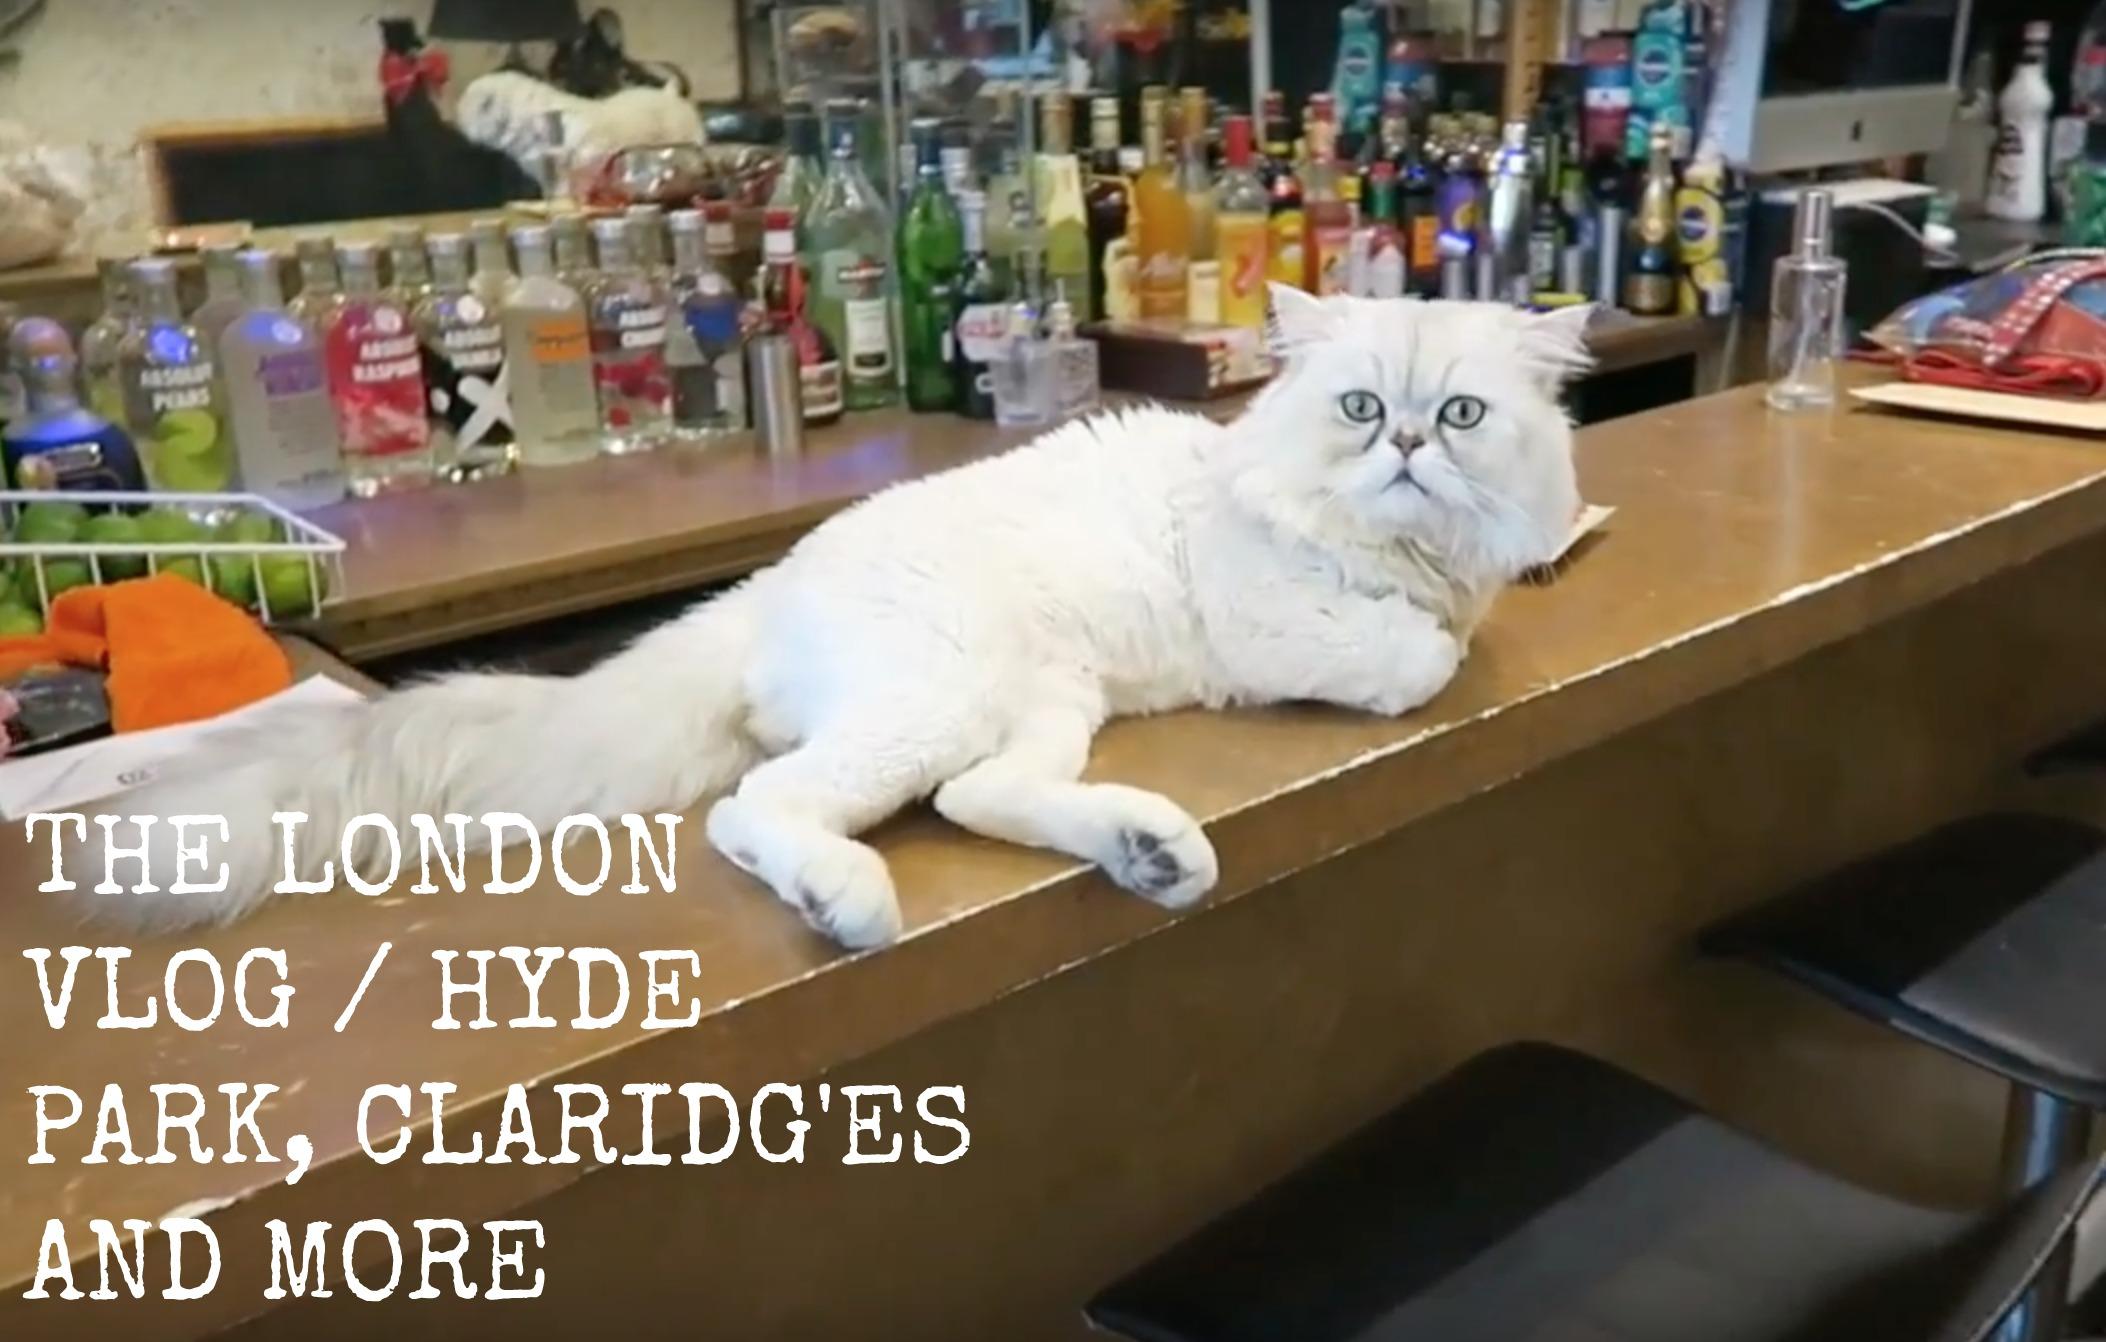 The London Vlog